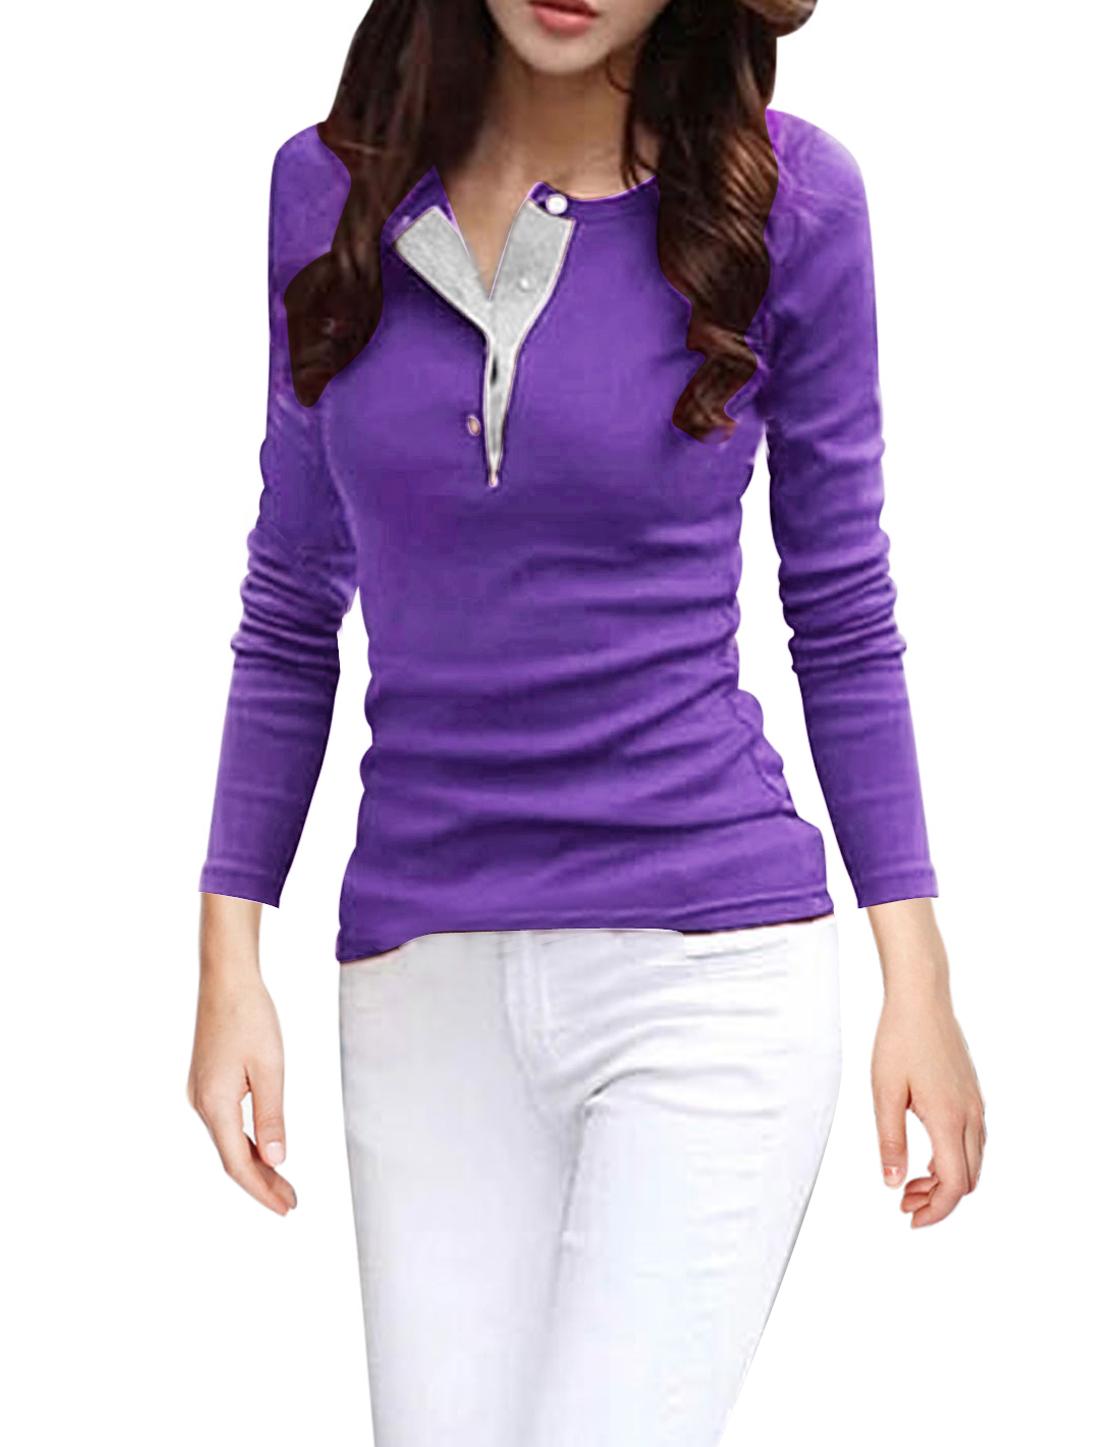 Women Soft Lining Round Neck Full Sleeve Chic Purple Shirts M